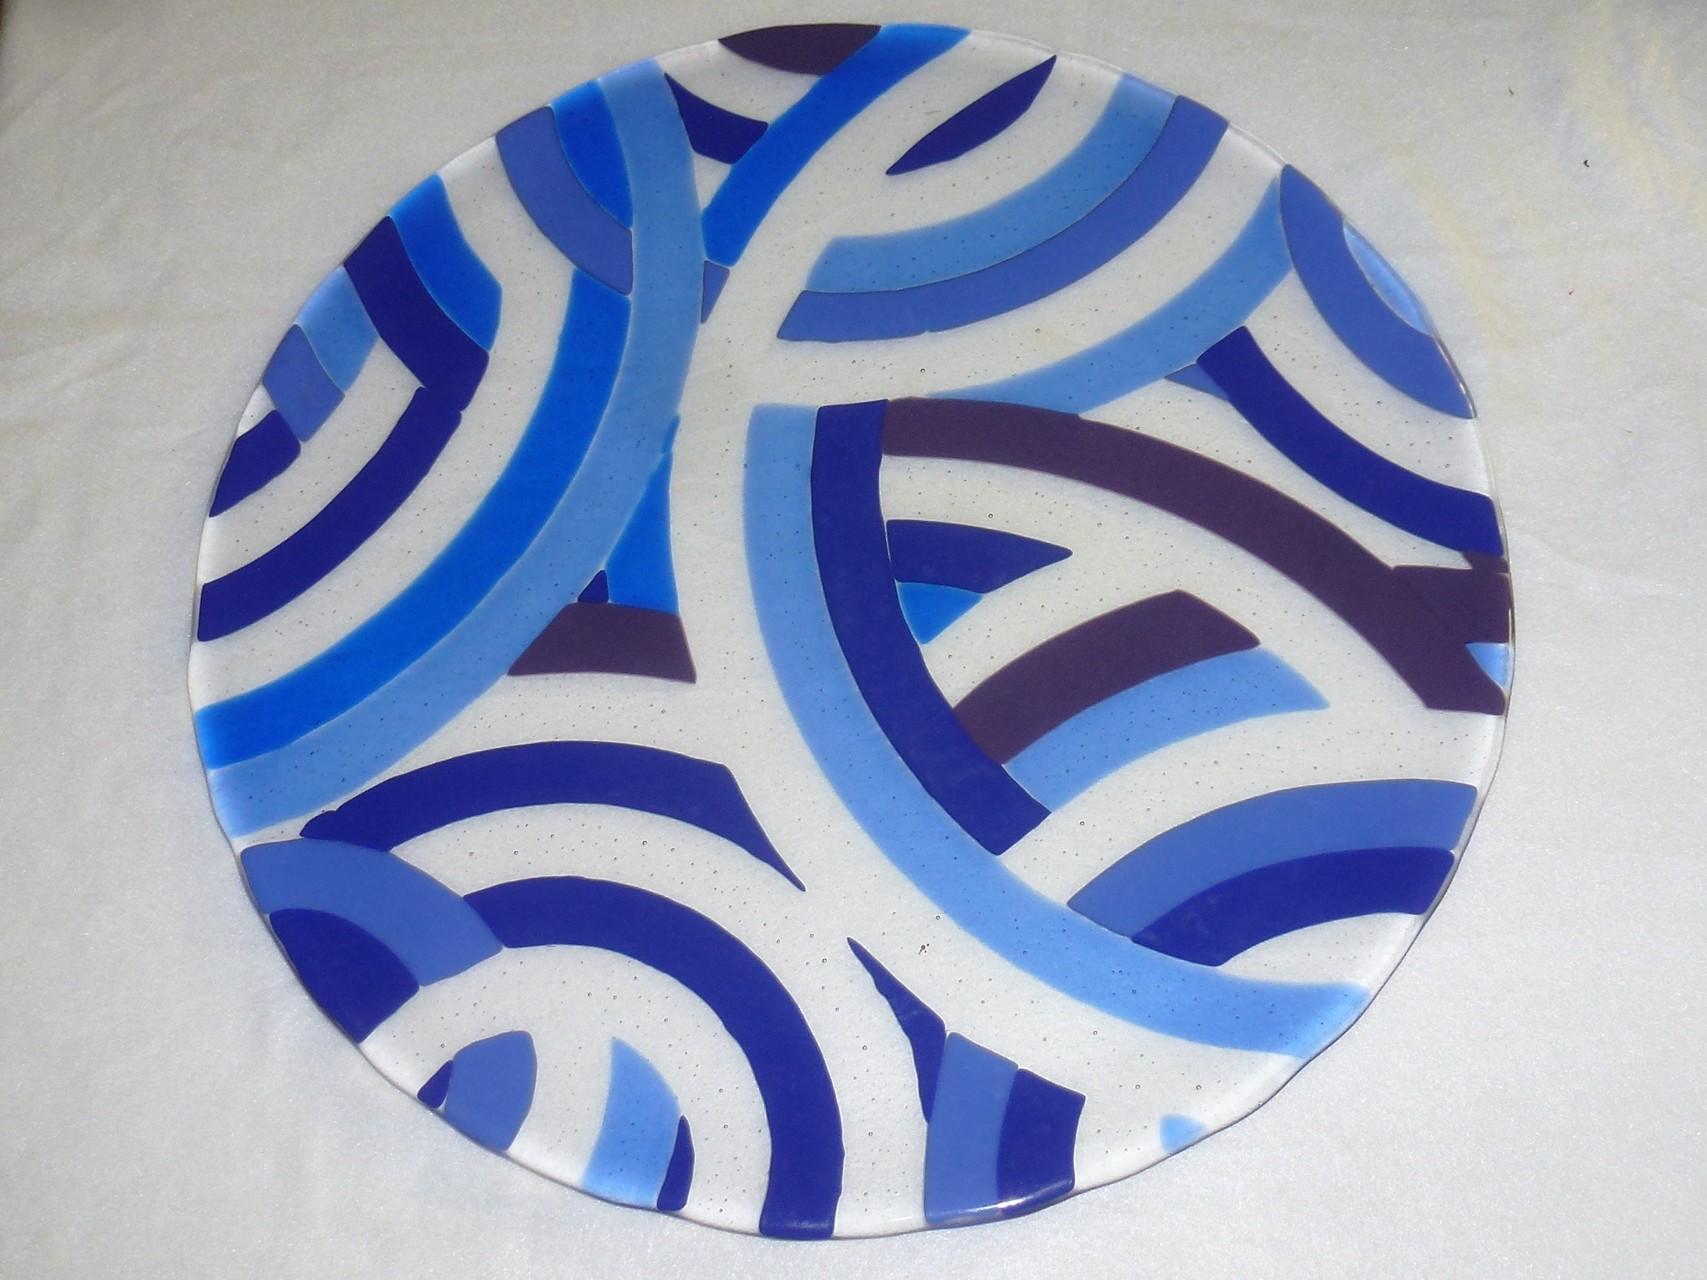 Bullseye Tekta/Farbglas blau opak